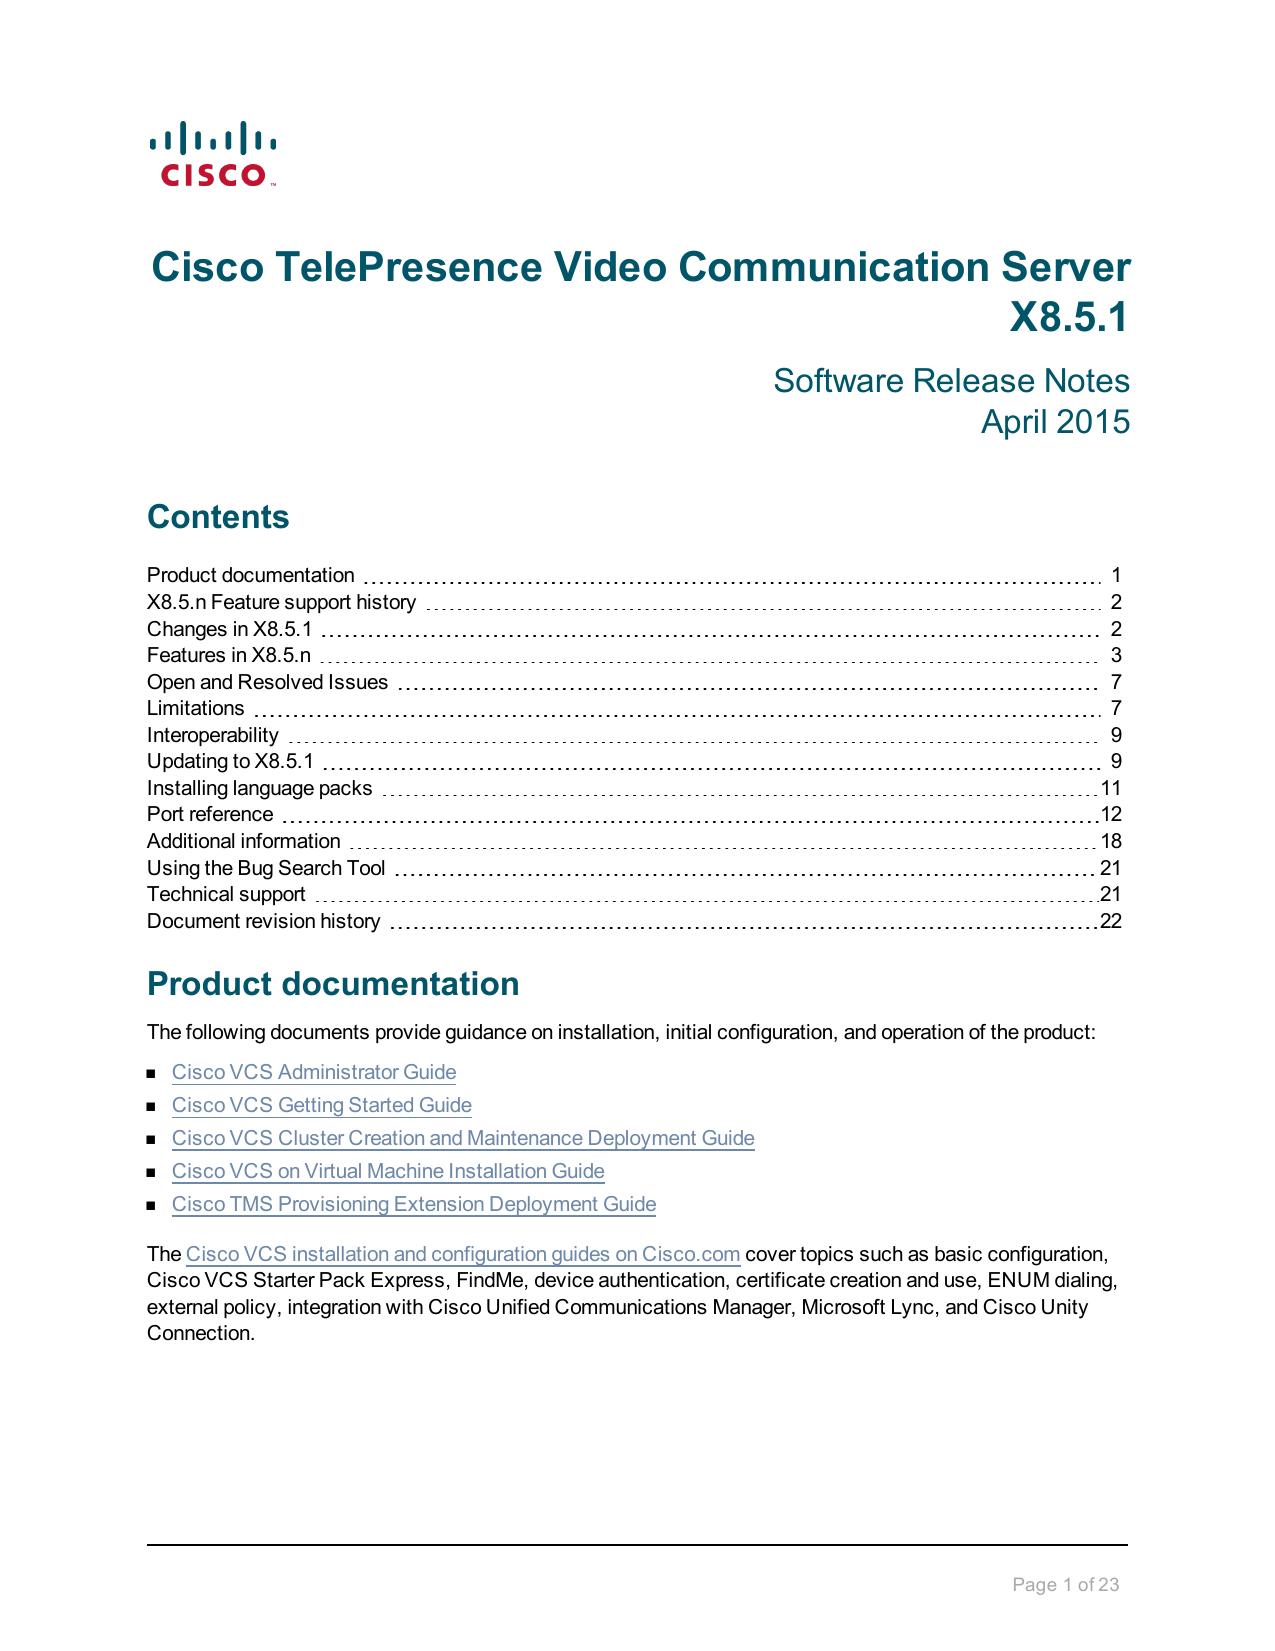 Cisco TelePresence Video Communication Server Release Note